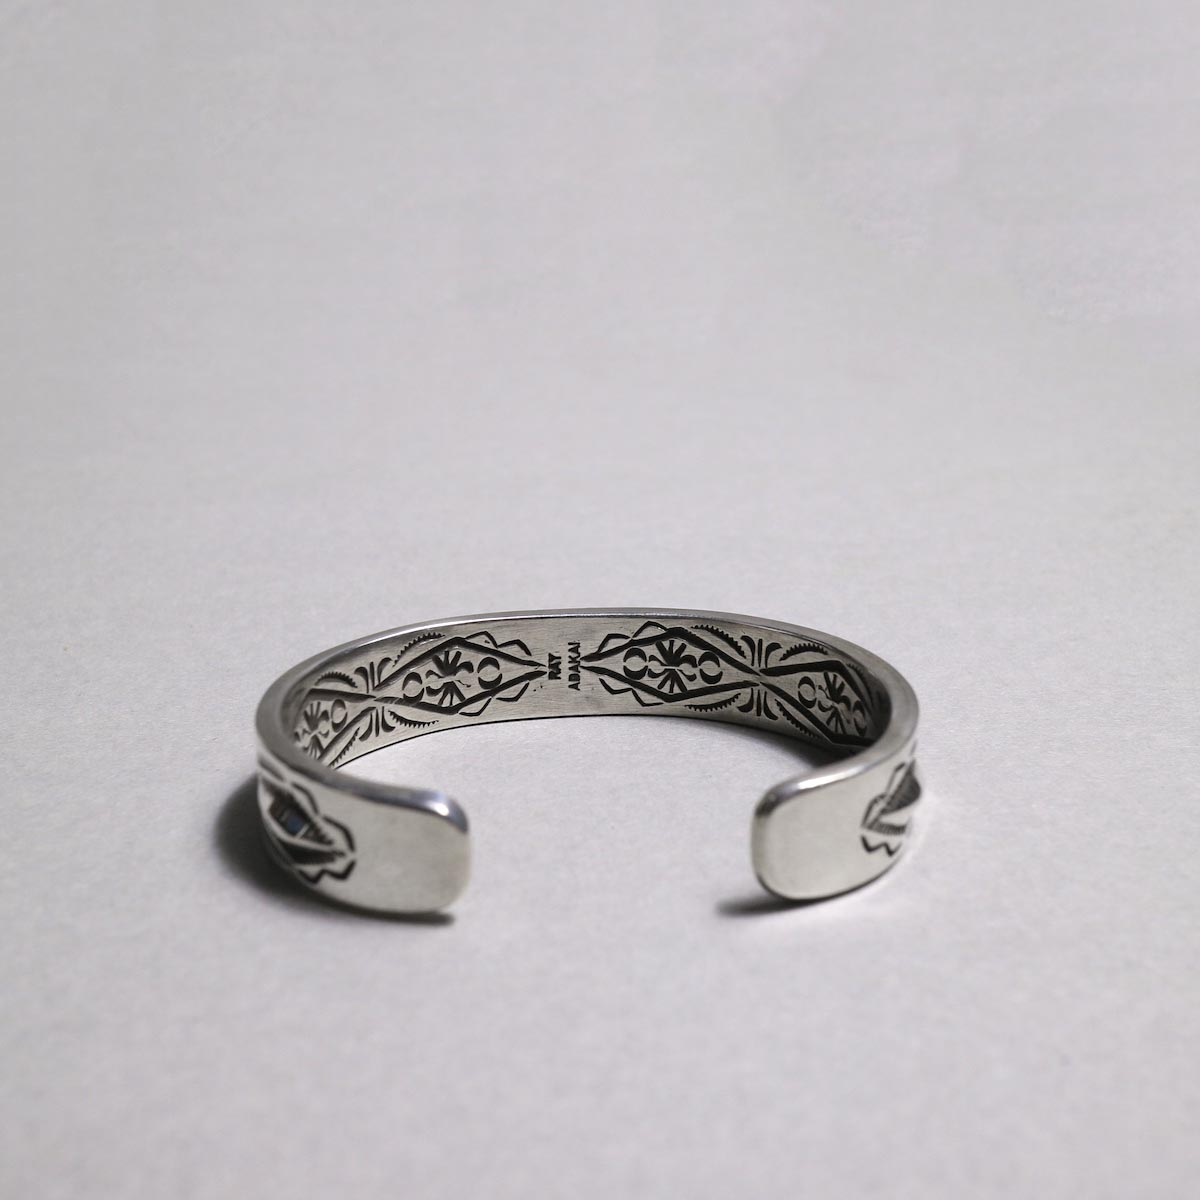 RAY ADAKAI / Double Stamp Bracelet (B)内側スタンプ